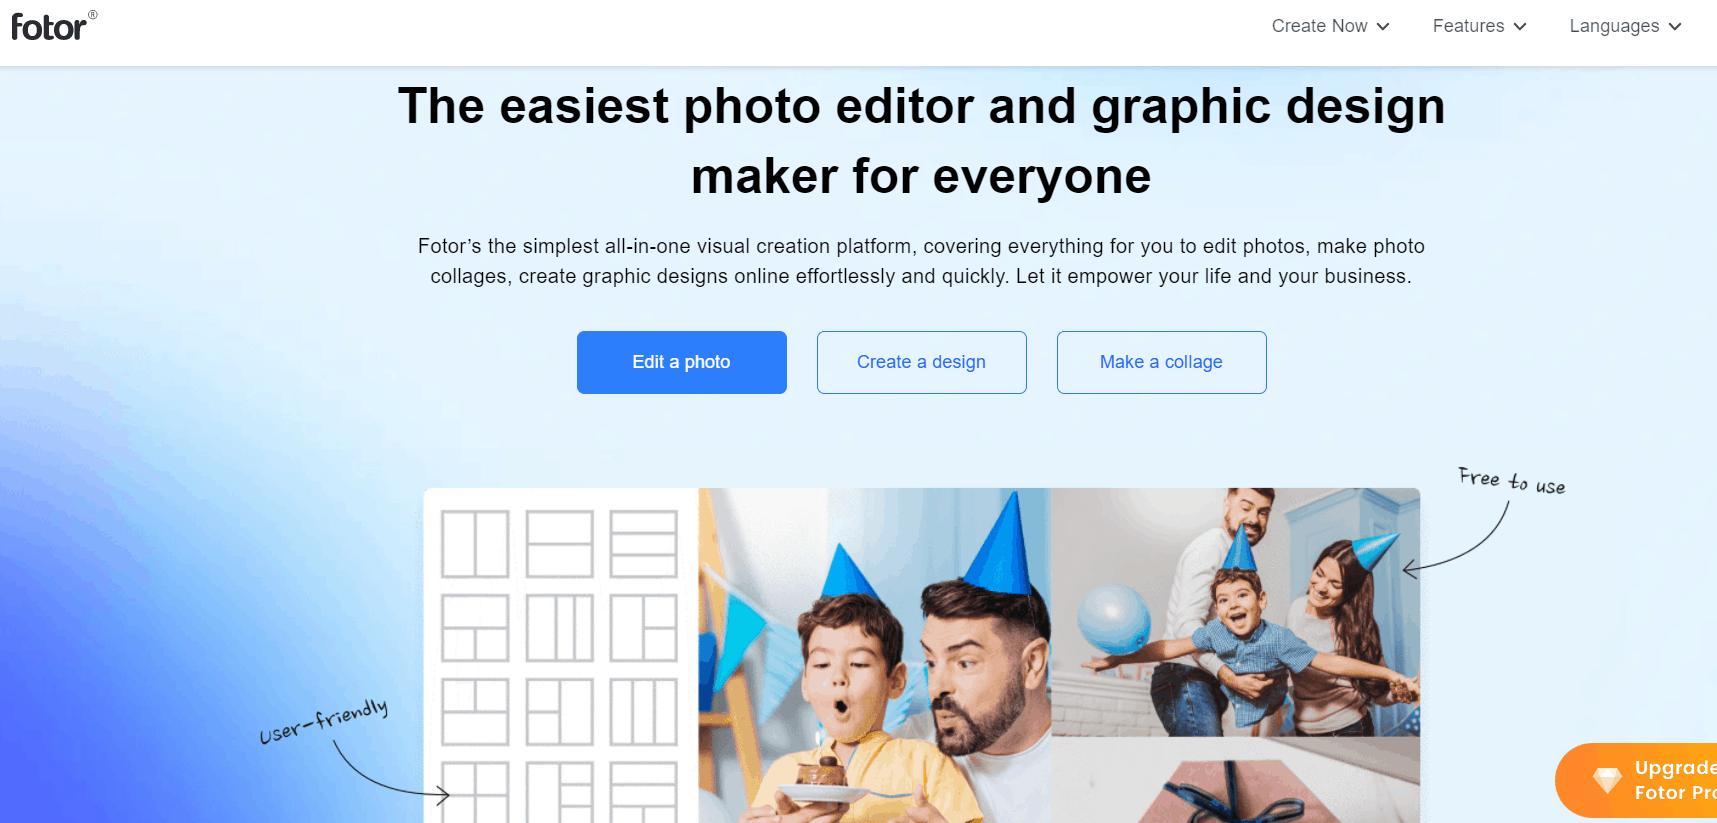 Fotor photo ediate and graphic design maker